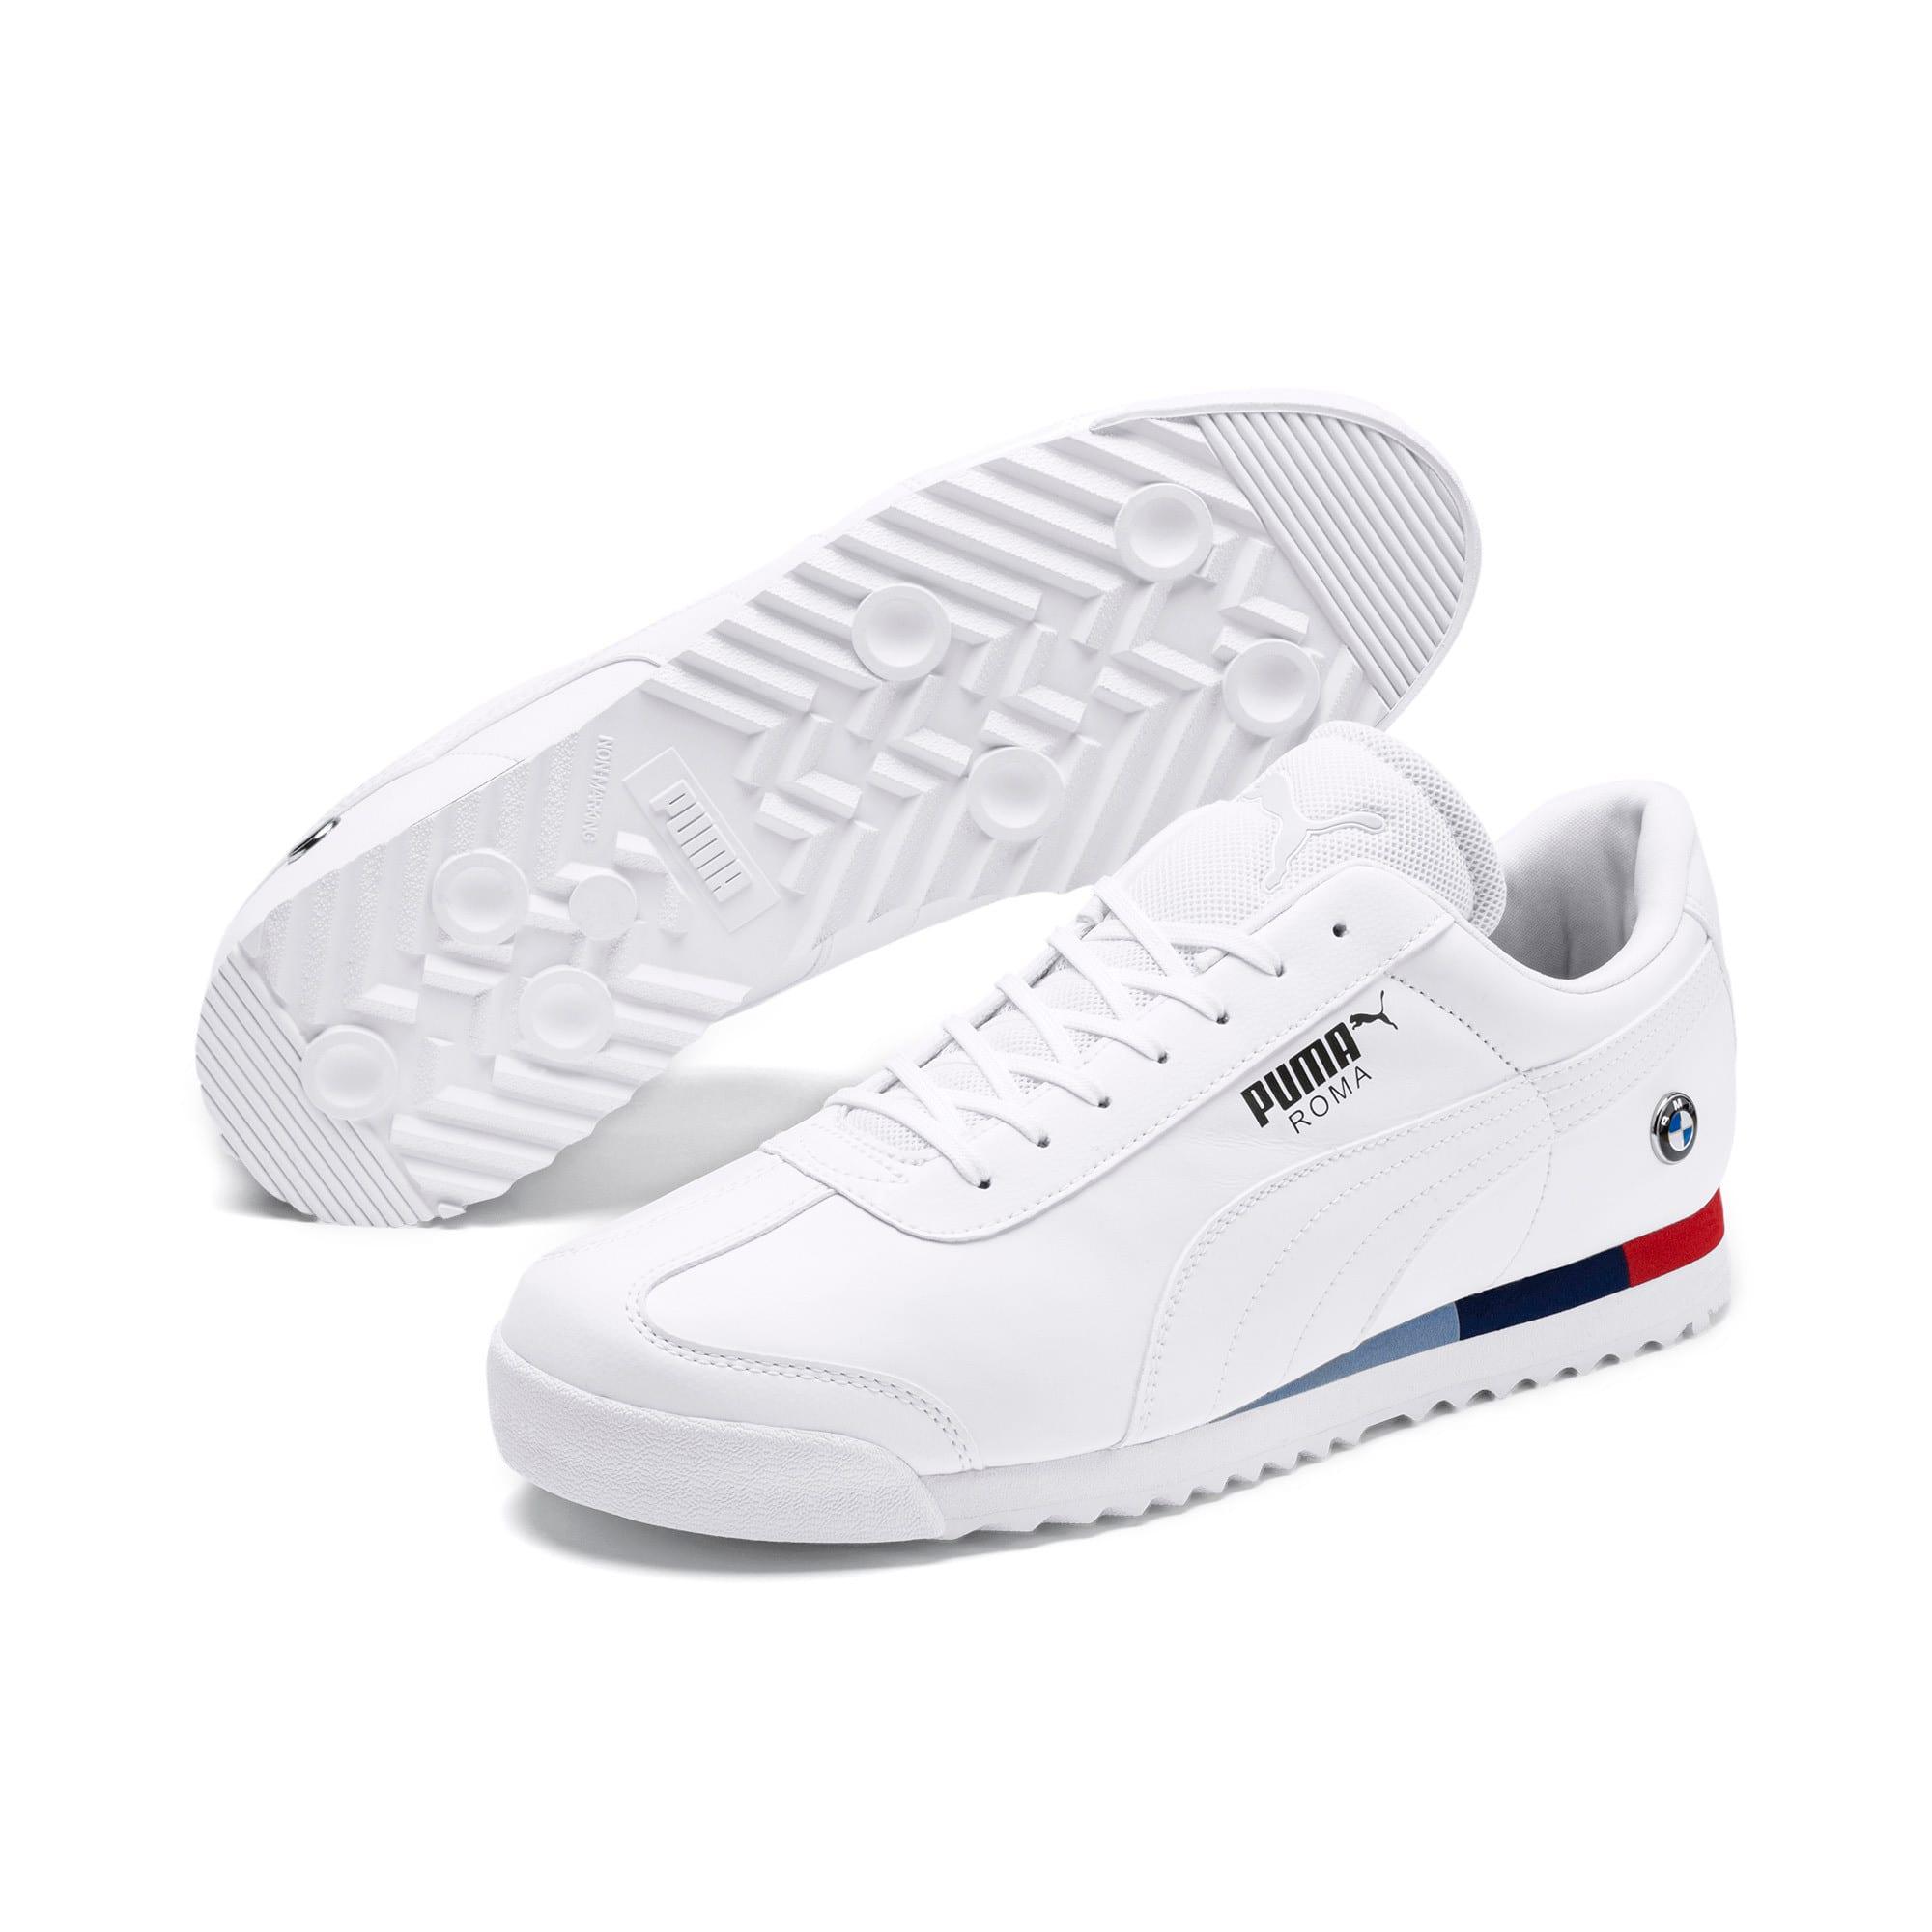 Thumbnail 2 of BMW MMS Roma sneakers voor heren, Puma White-Puma White, medium